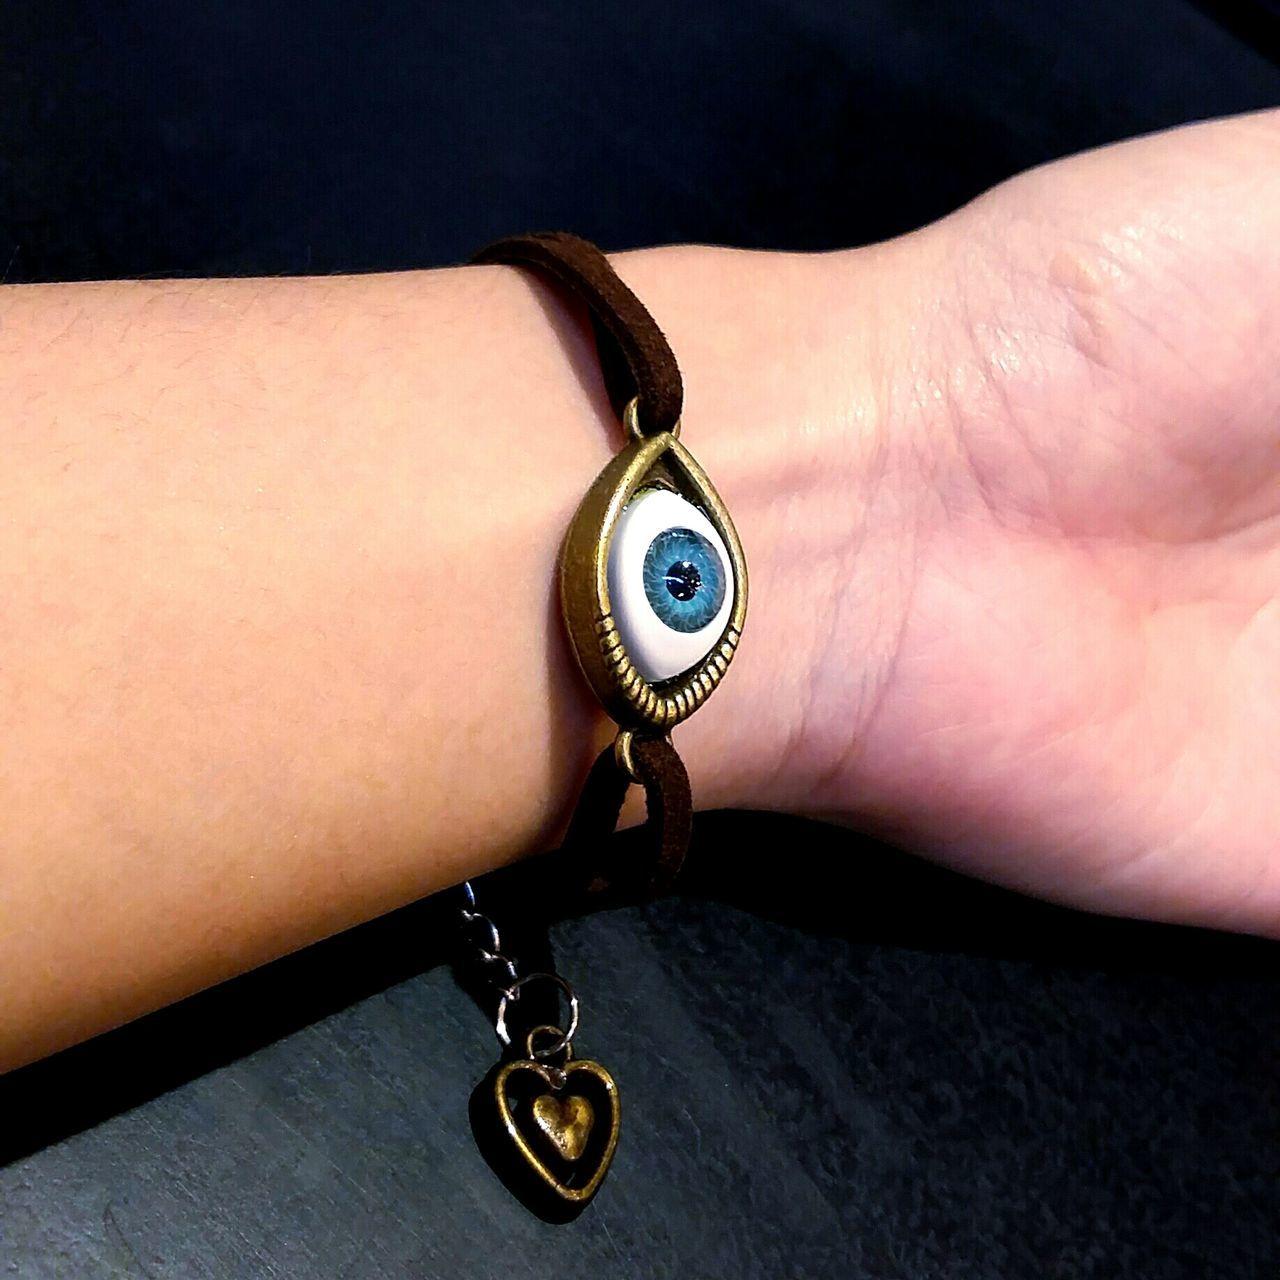 Eye Accesories Jewellery Bracelet DIY Vintage Accessory Photo Photography Lady Woman Close-up Bangkok Bkk Thailand Thailand